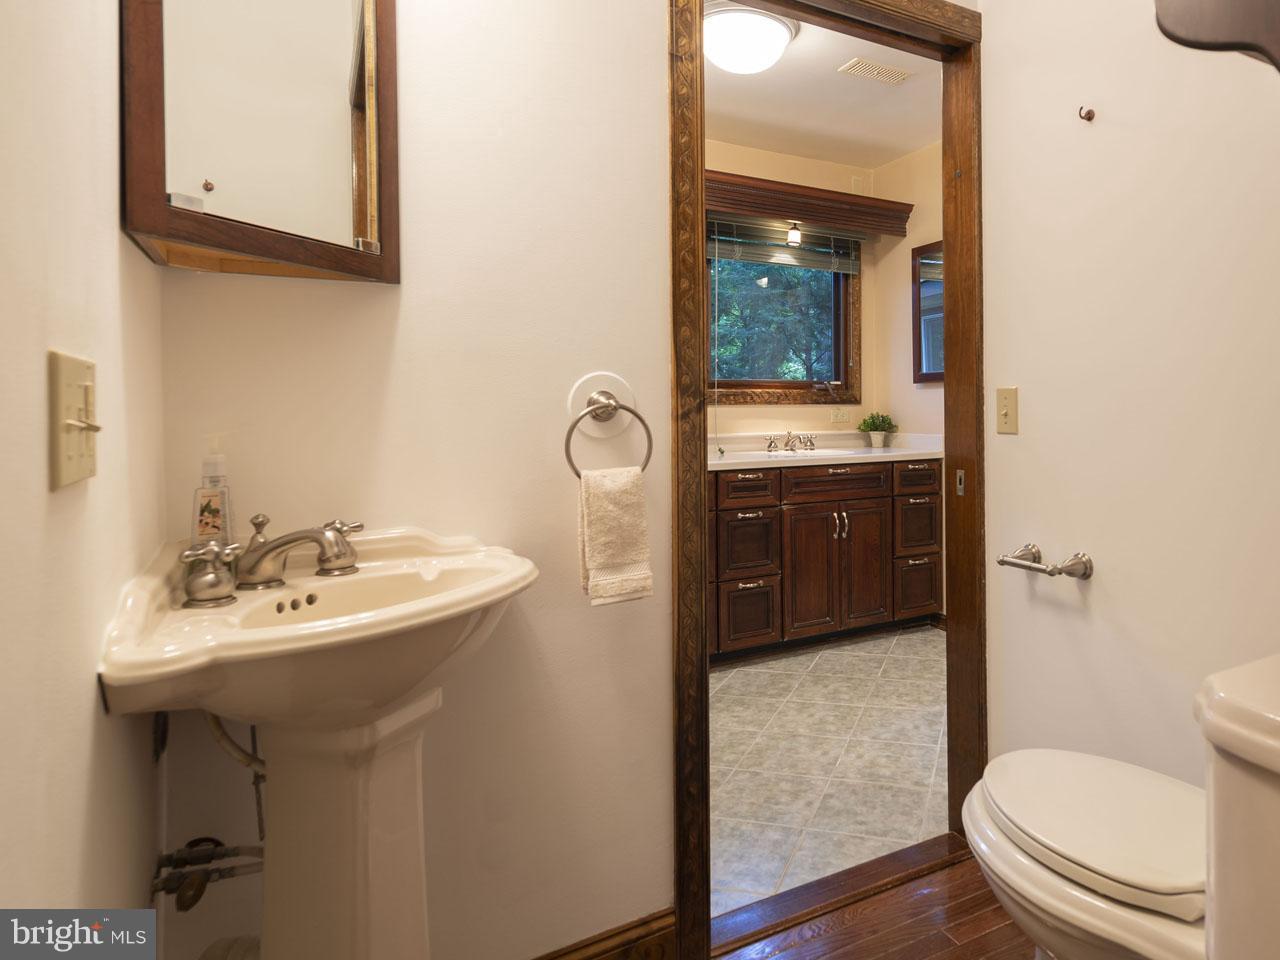 1002303700-300502418972-2021-07-22-03-27-23  |   | Alexandria Delaware Real Estate For Sale | MLS# 1002303700  - Best of Northern Virginia